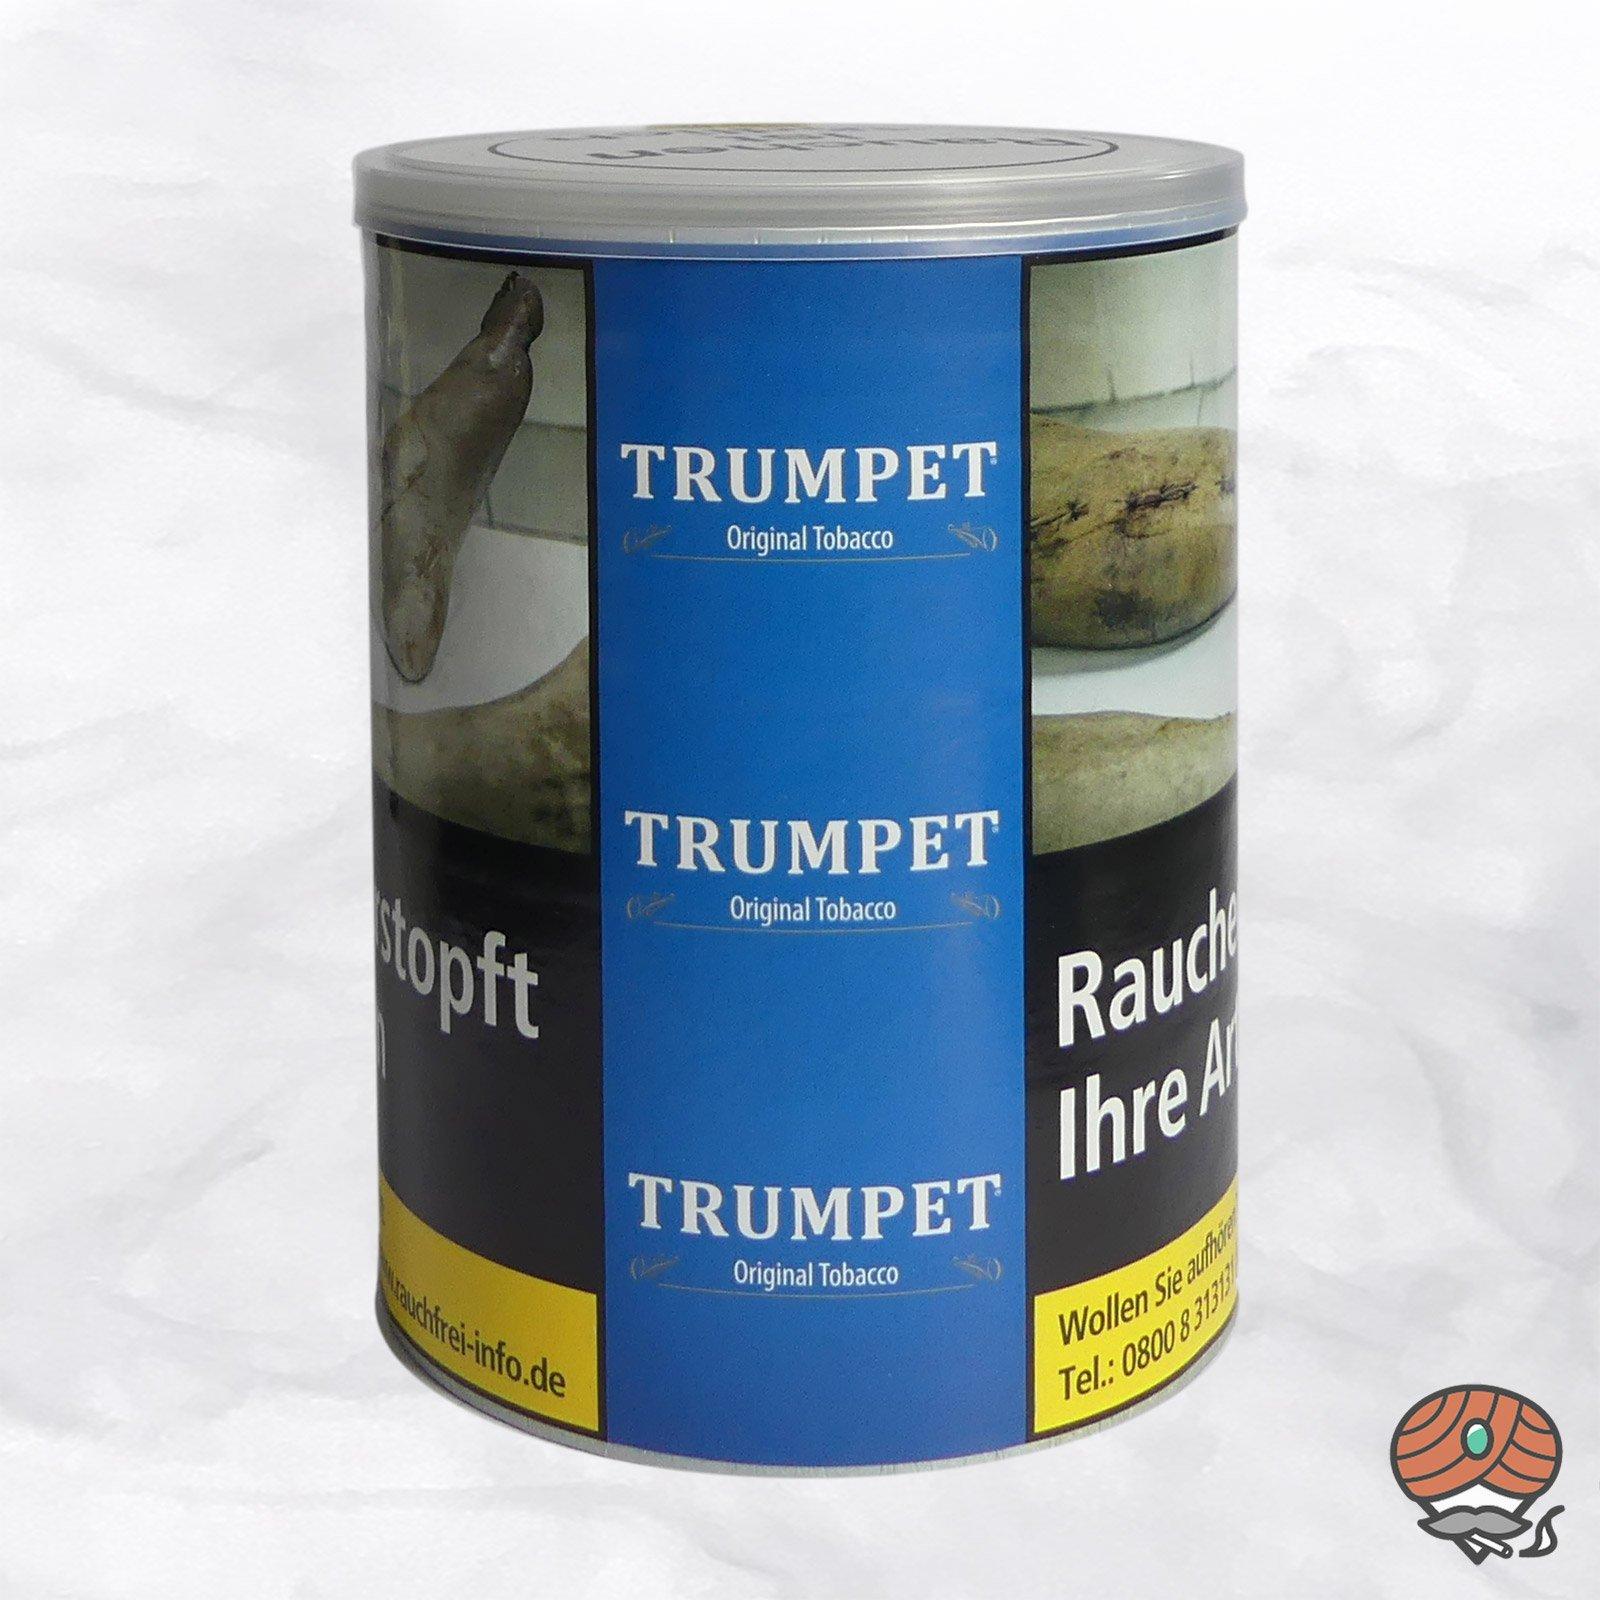 Trumpet Original Tobacco Drehtabak 130 g Dose